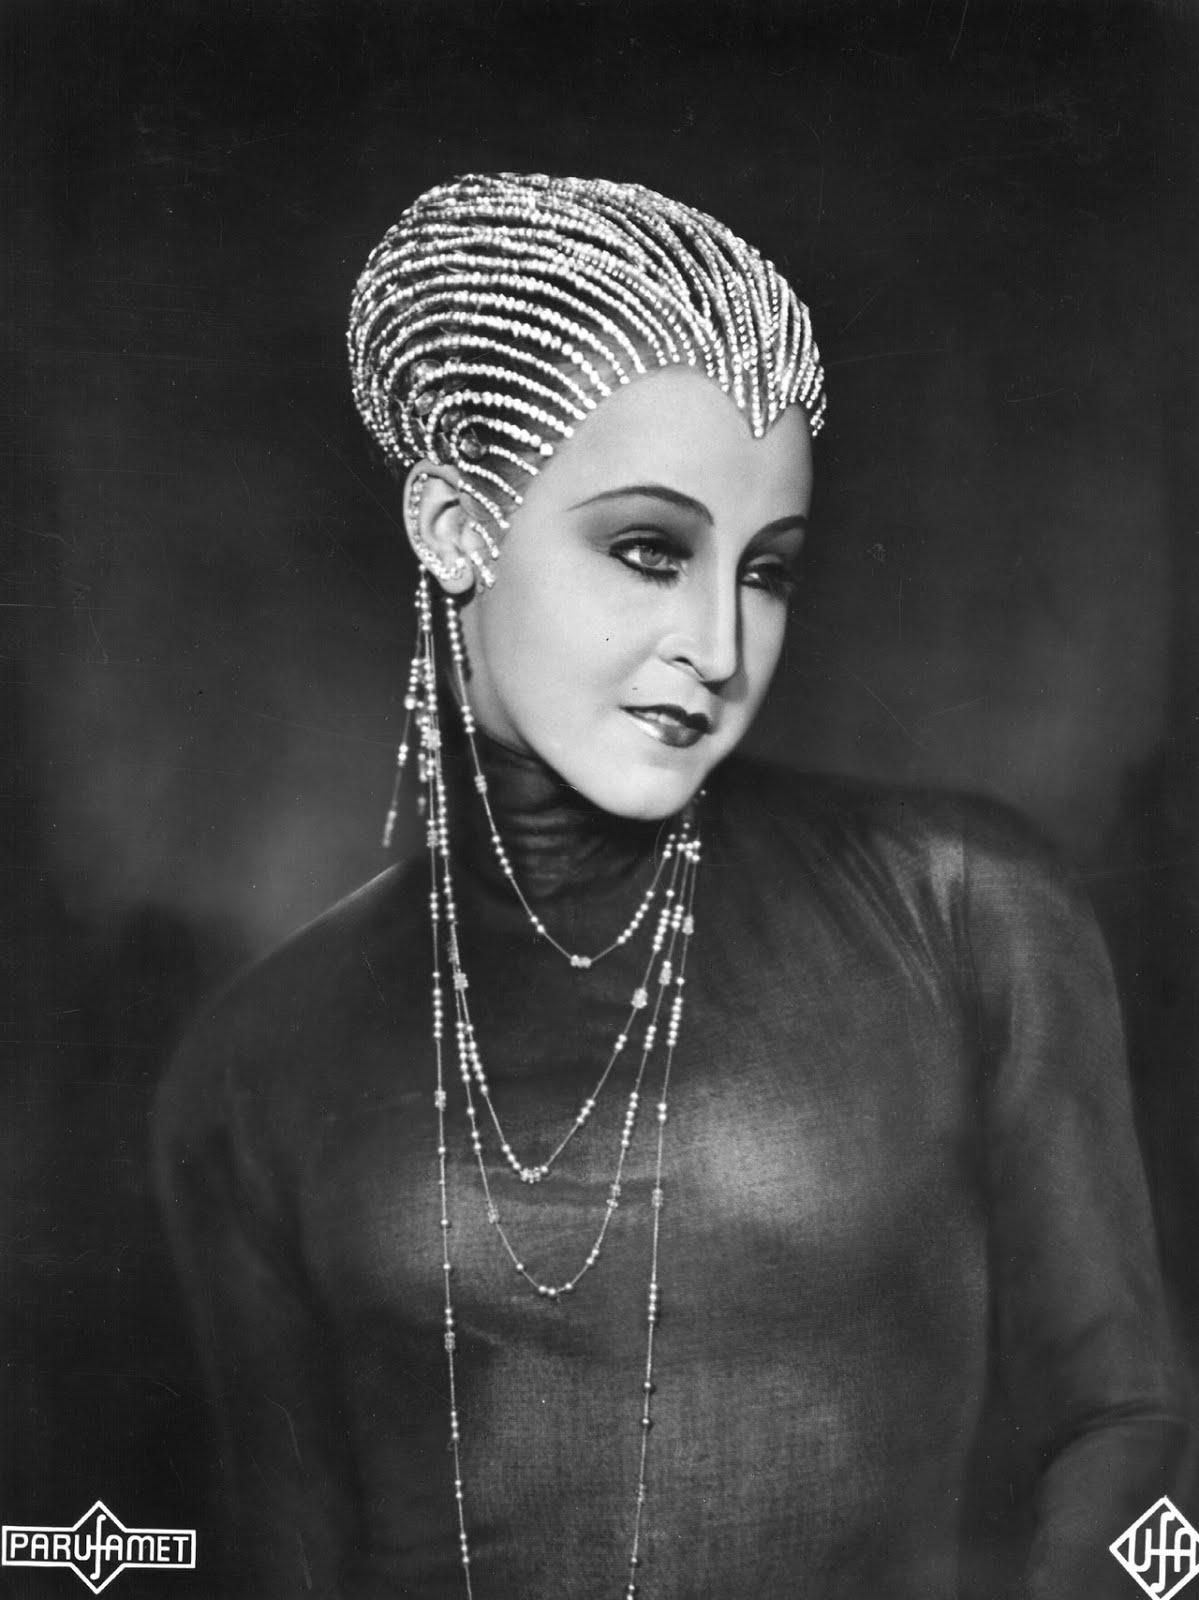 Brigitte Helm, A Deusa Eterna De Yoshiwara!!!